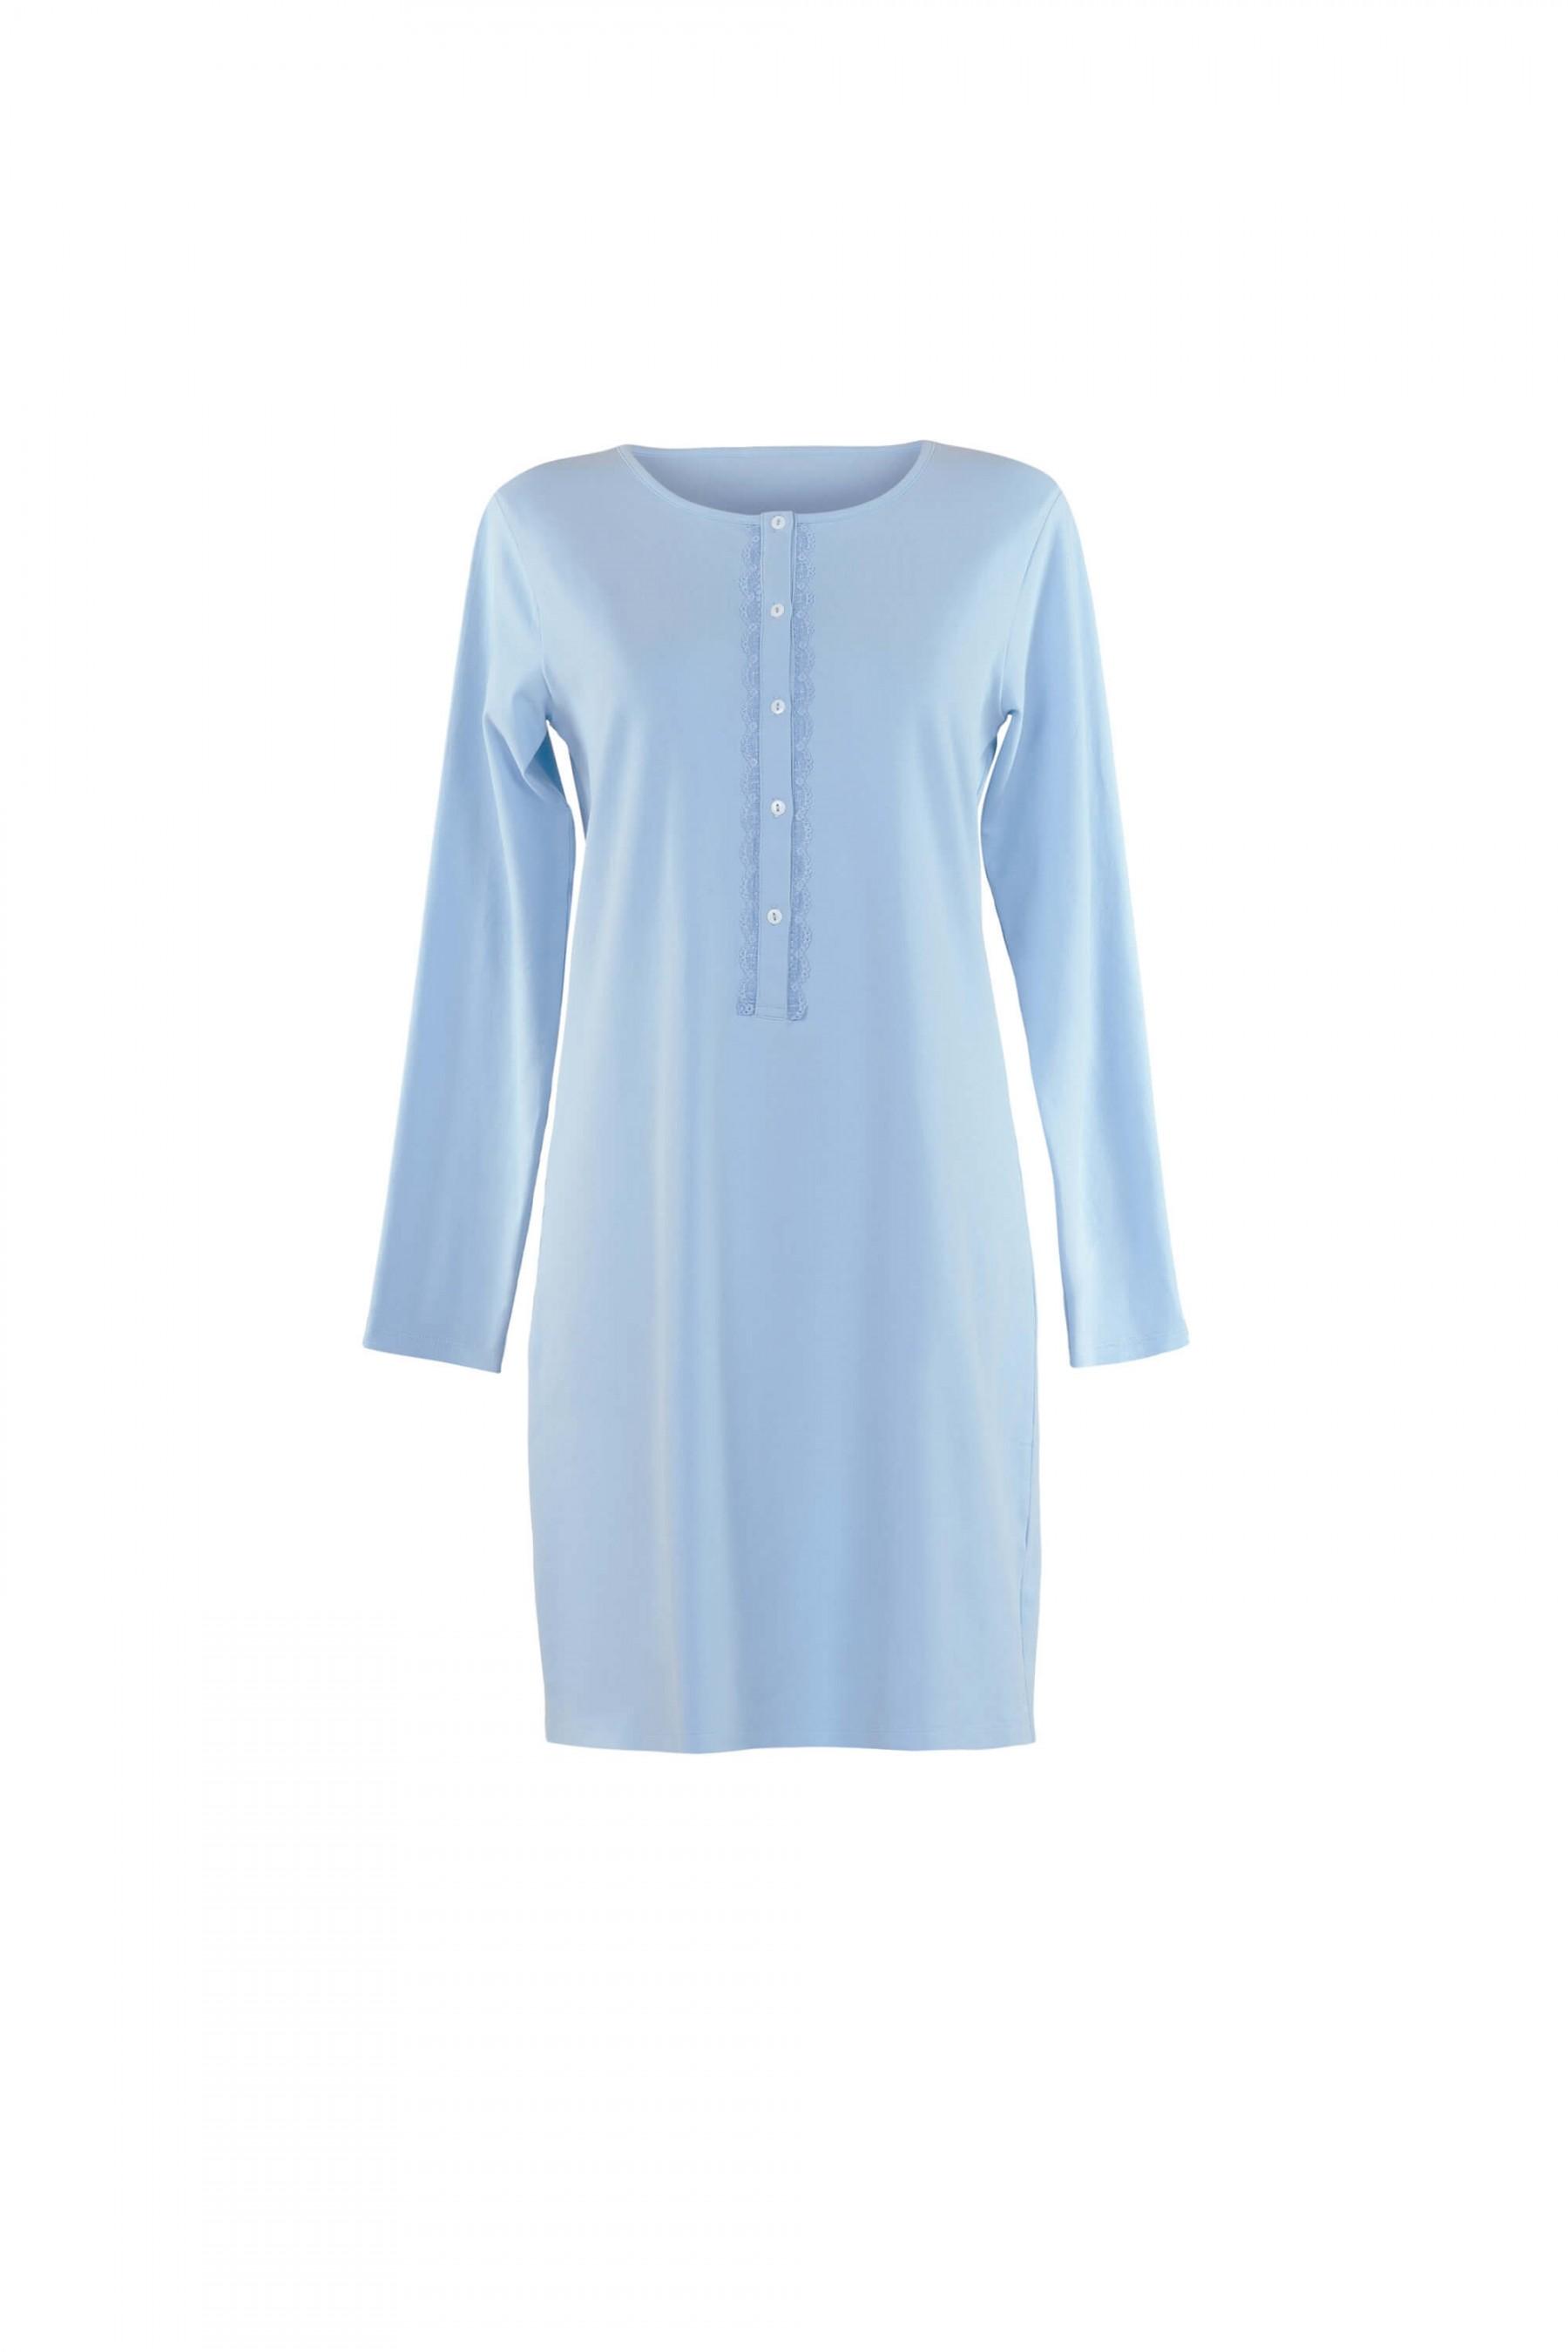 63400 - »Cheerful« Nightdress